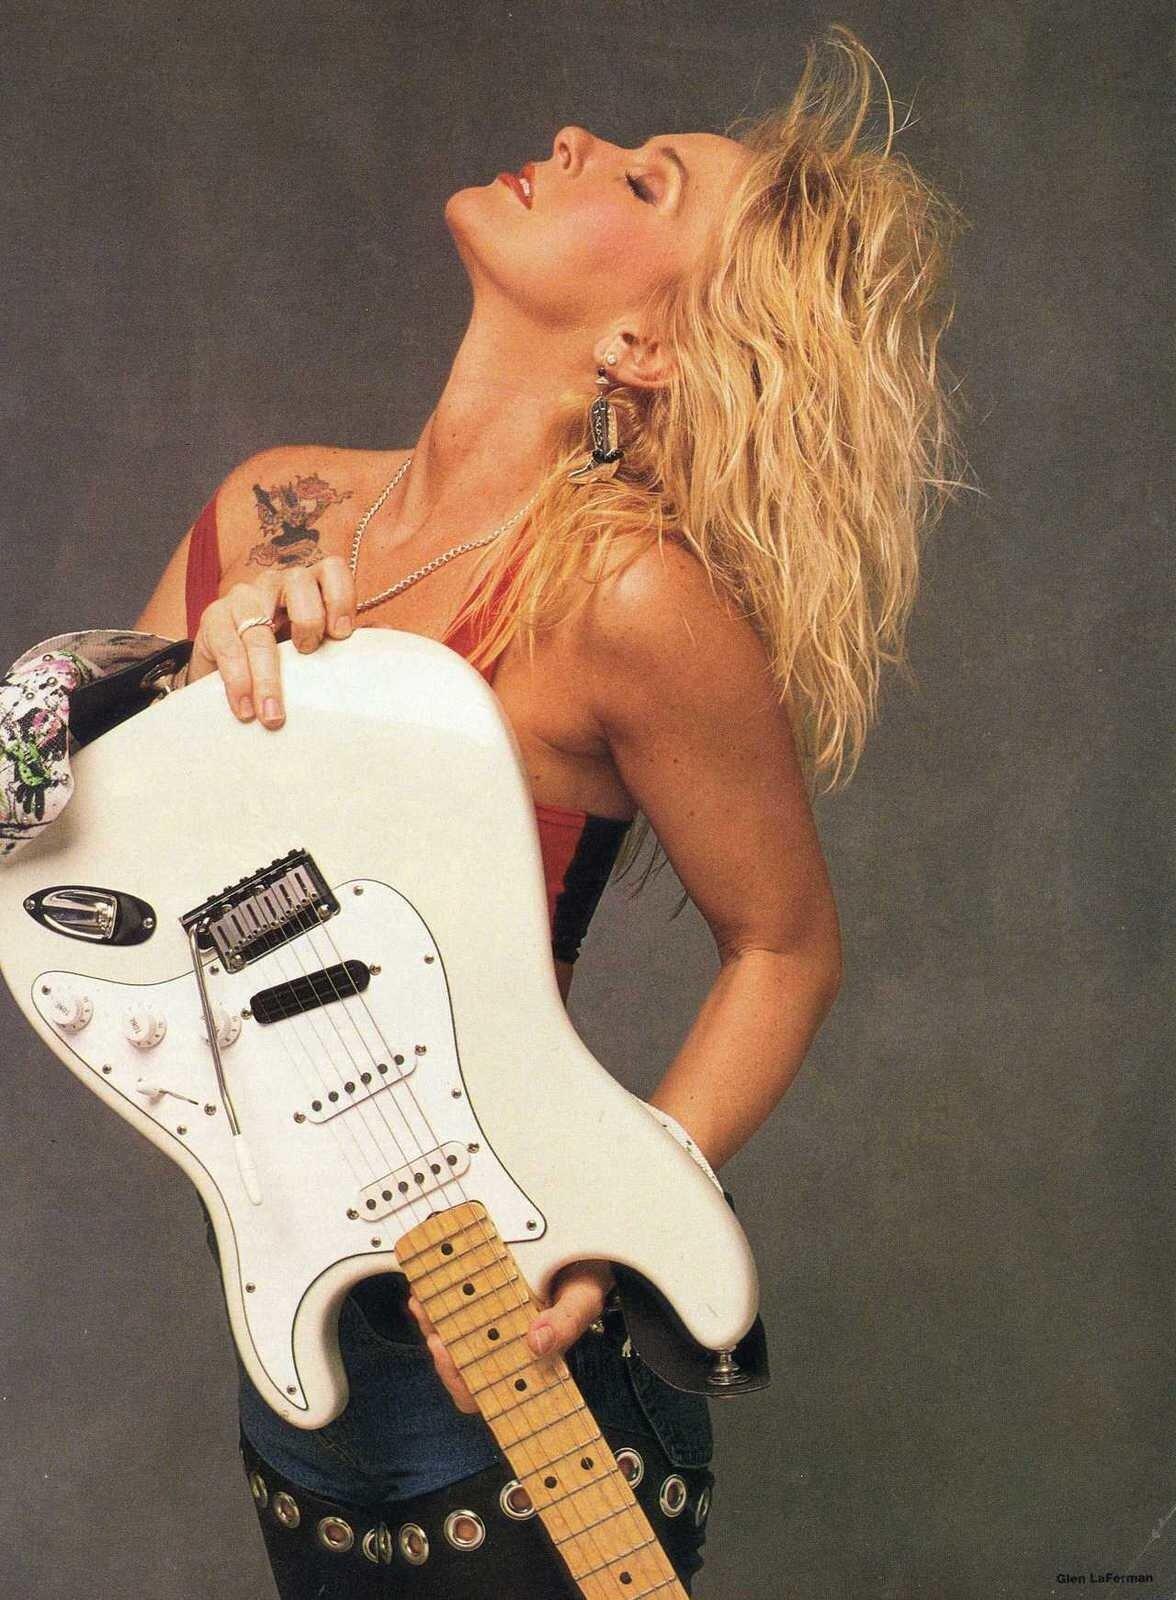 Love guitars and the nashville skyline